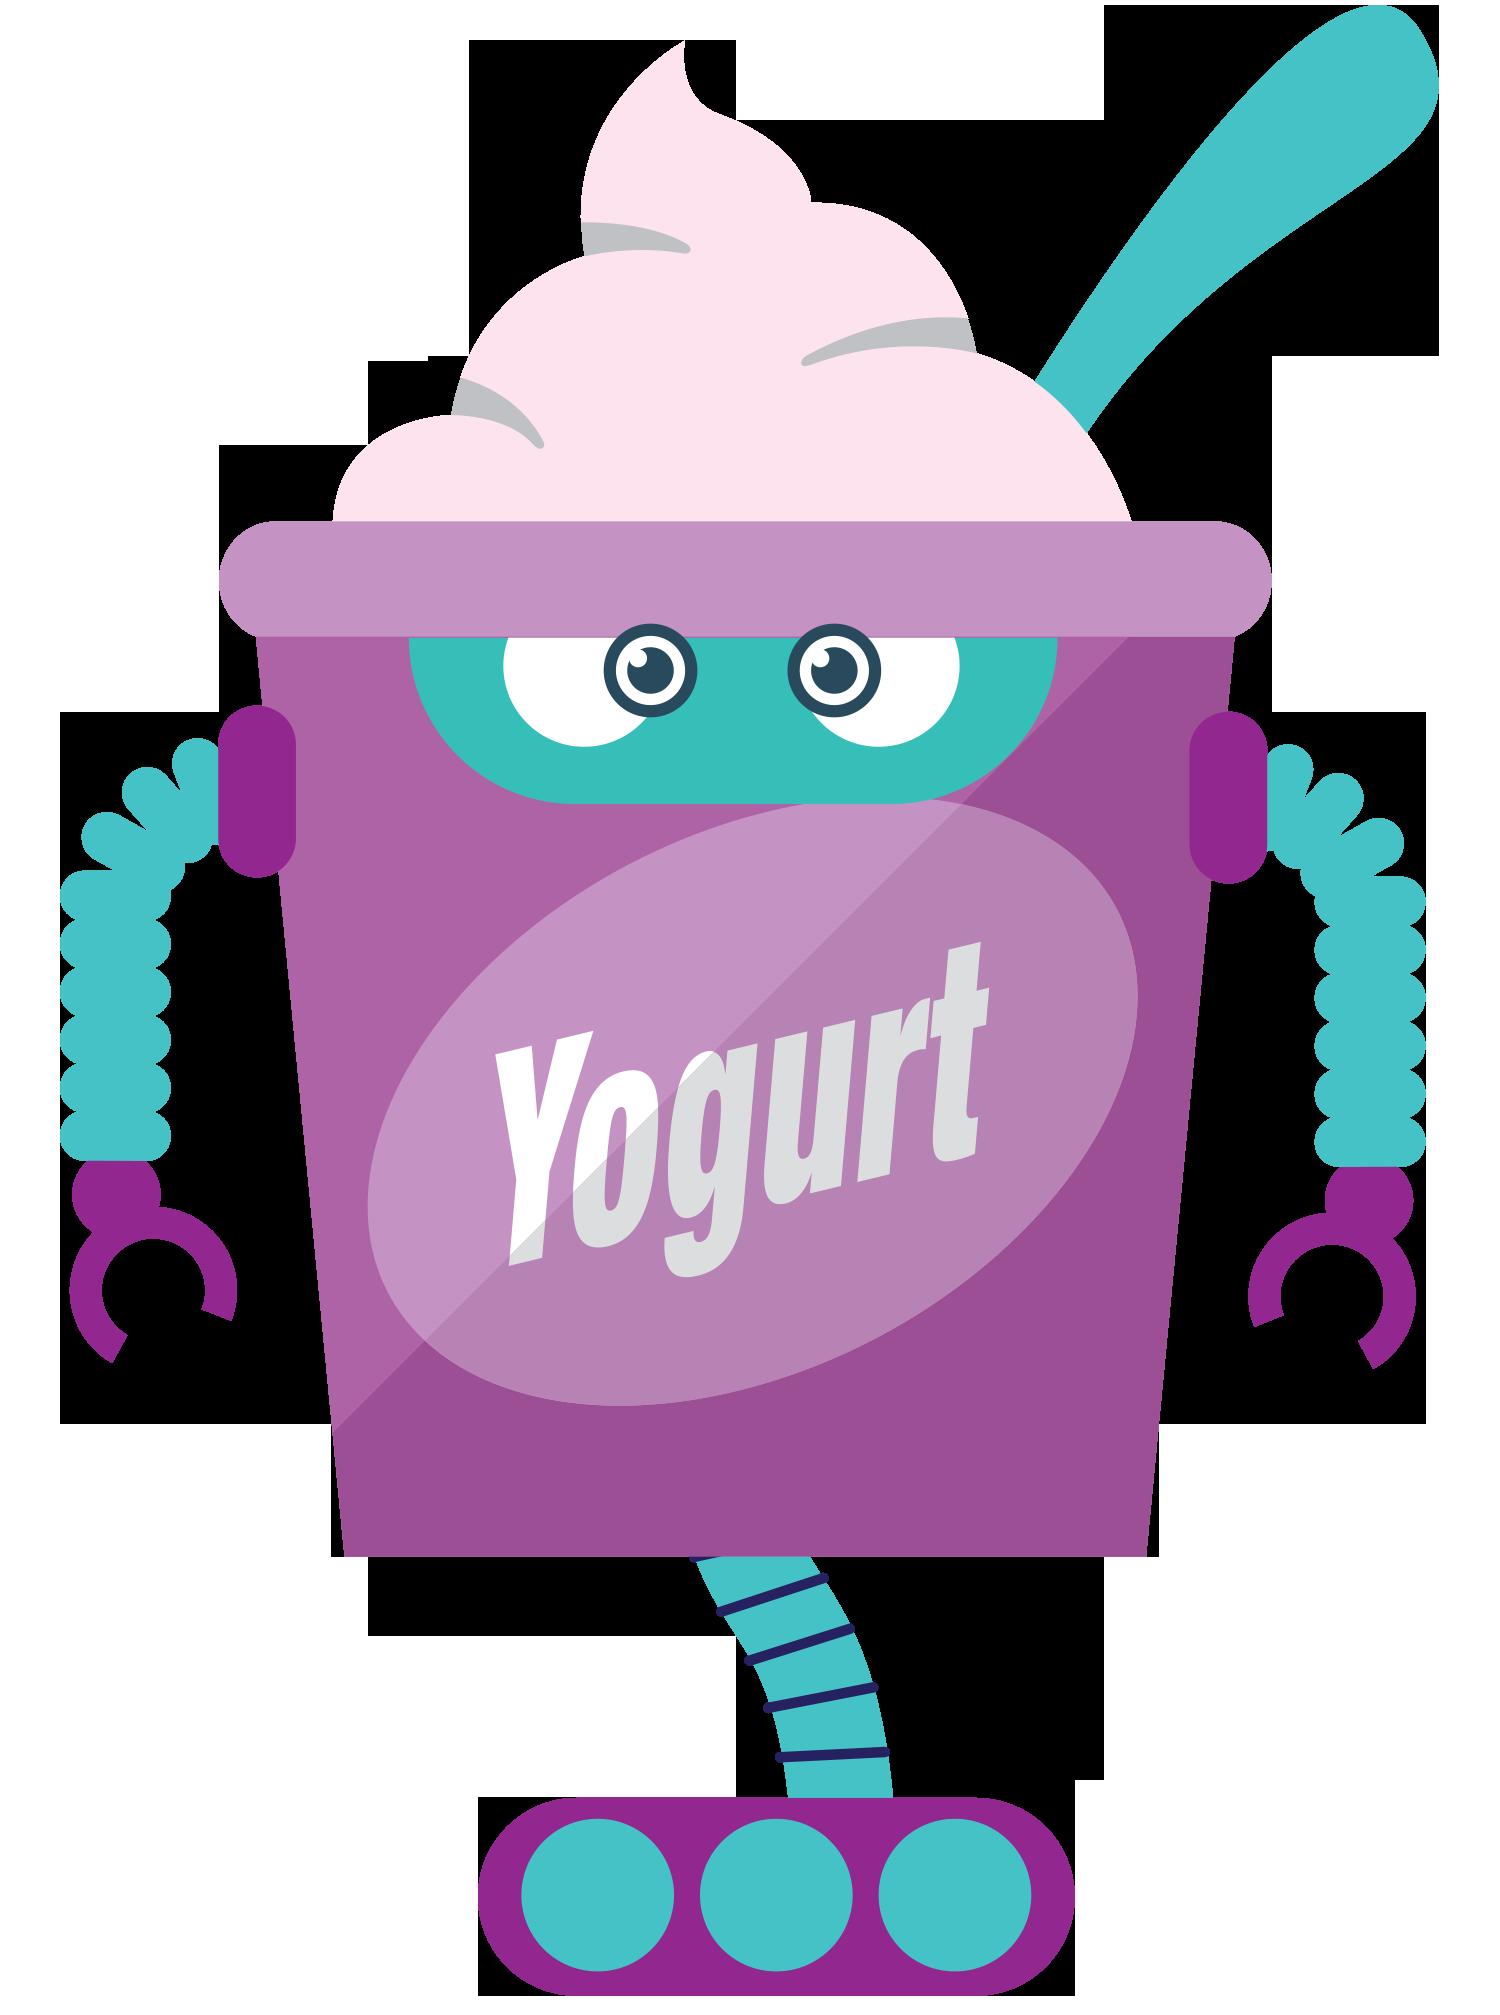 NSBW2020-Hi Tech_Yogurt.png